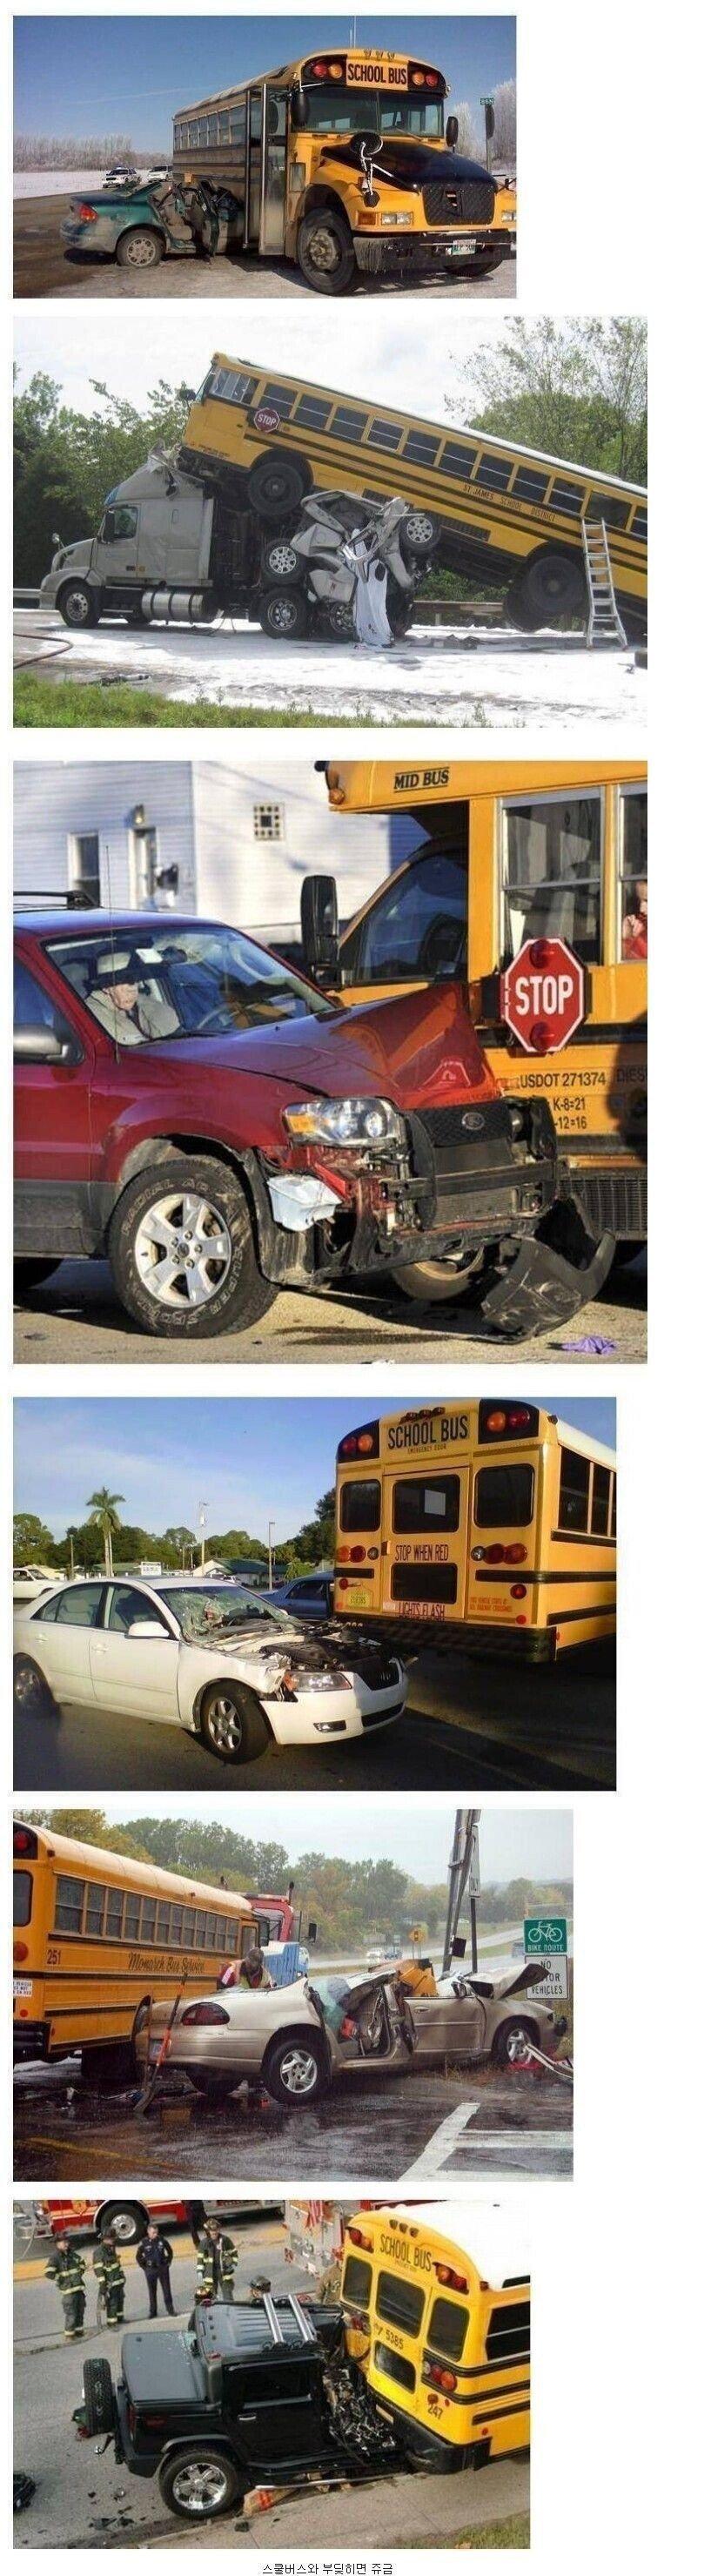 GAGCV.jpg 미국인들이 스쿨존에서 운전 조심하는 이유